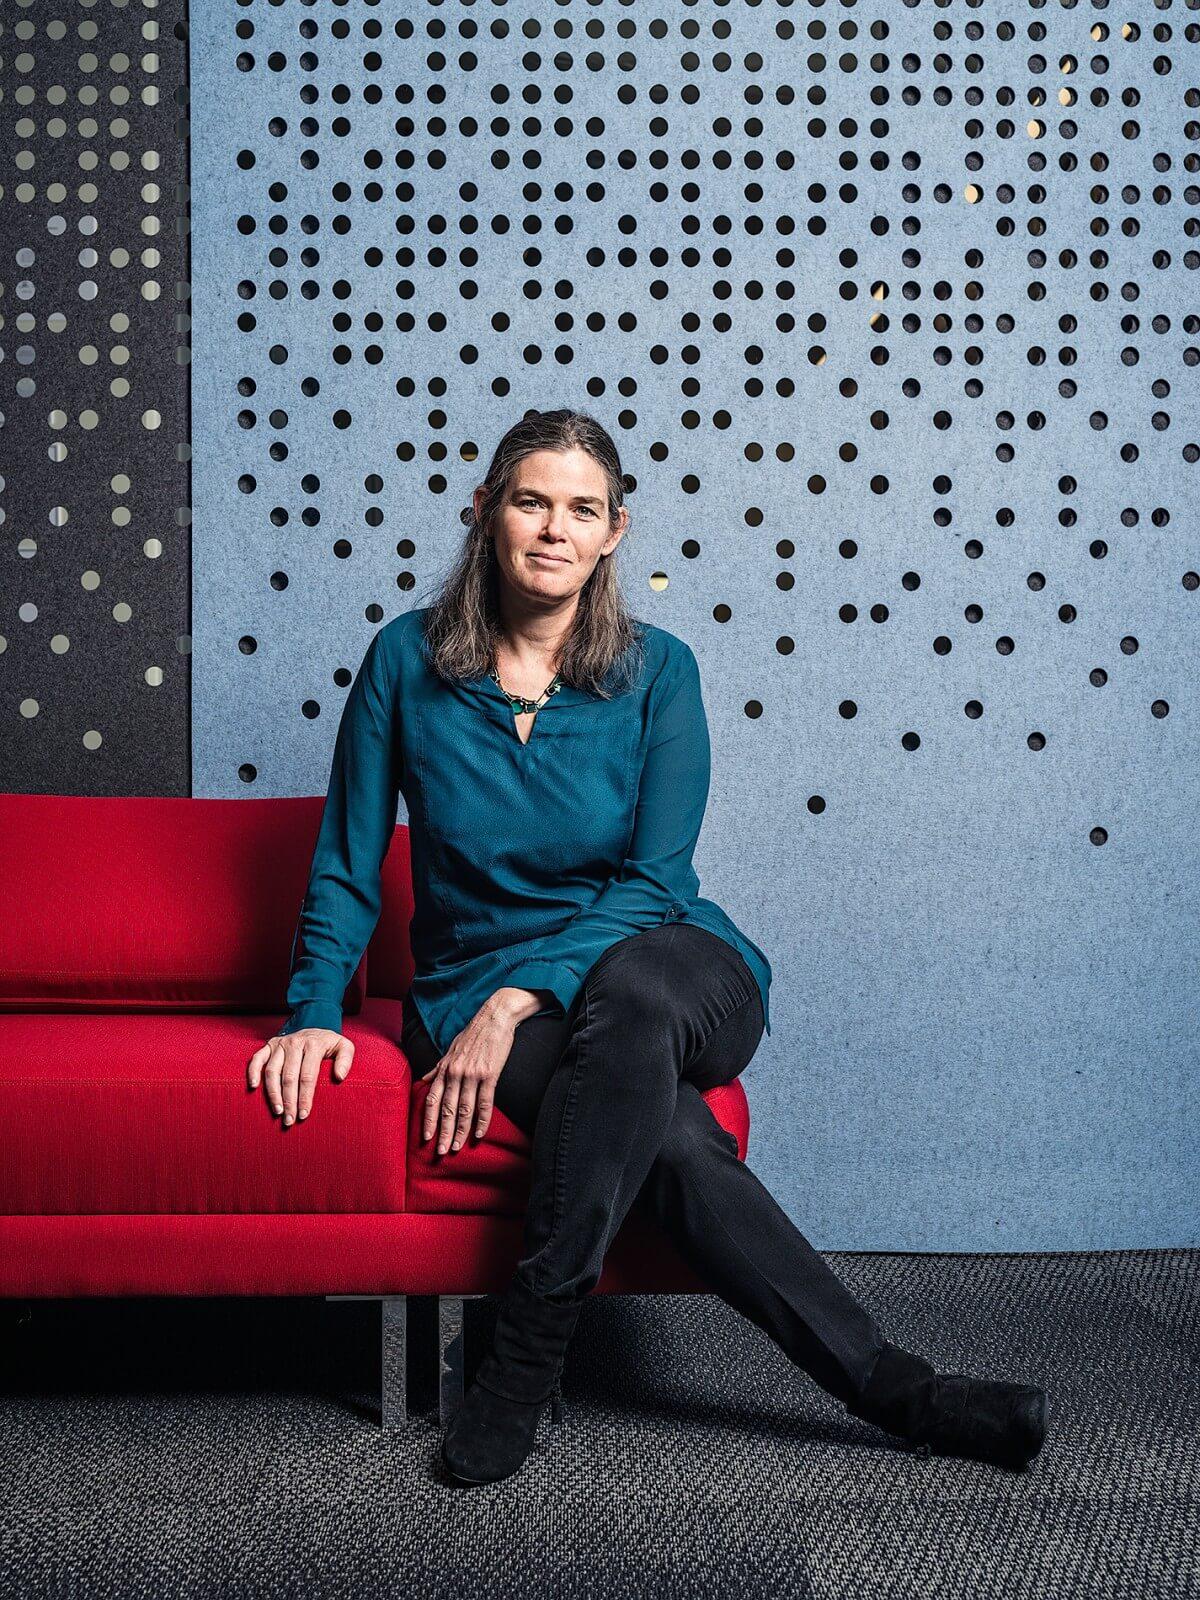 Daphne Koller at Coursera